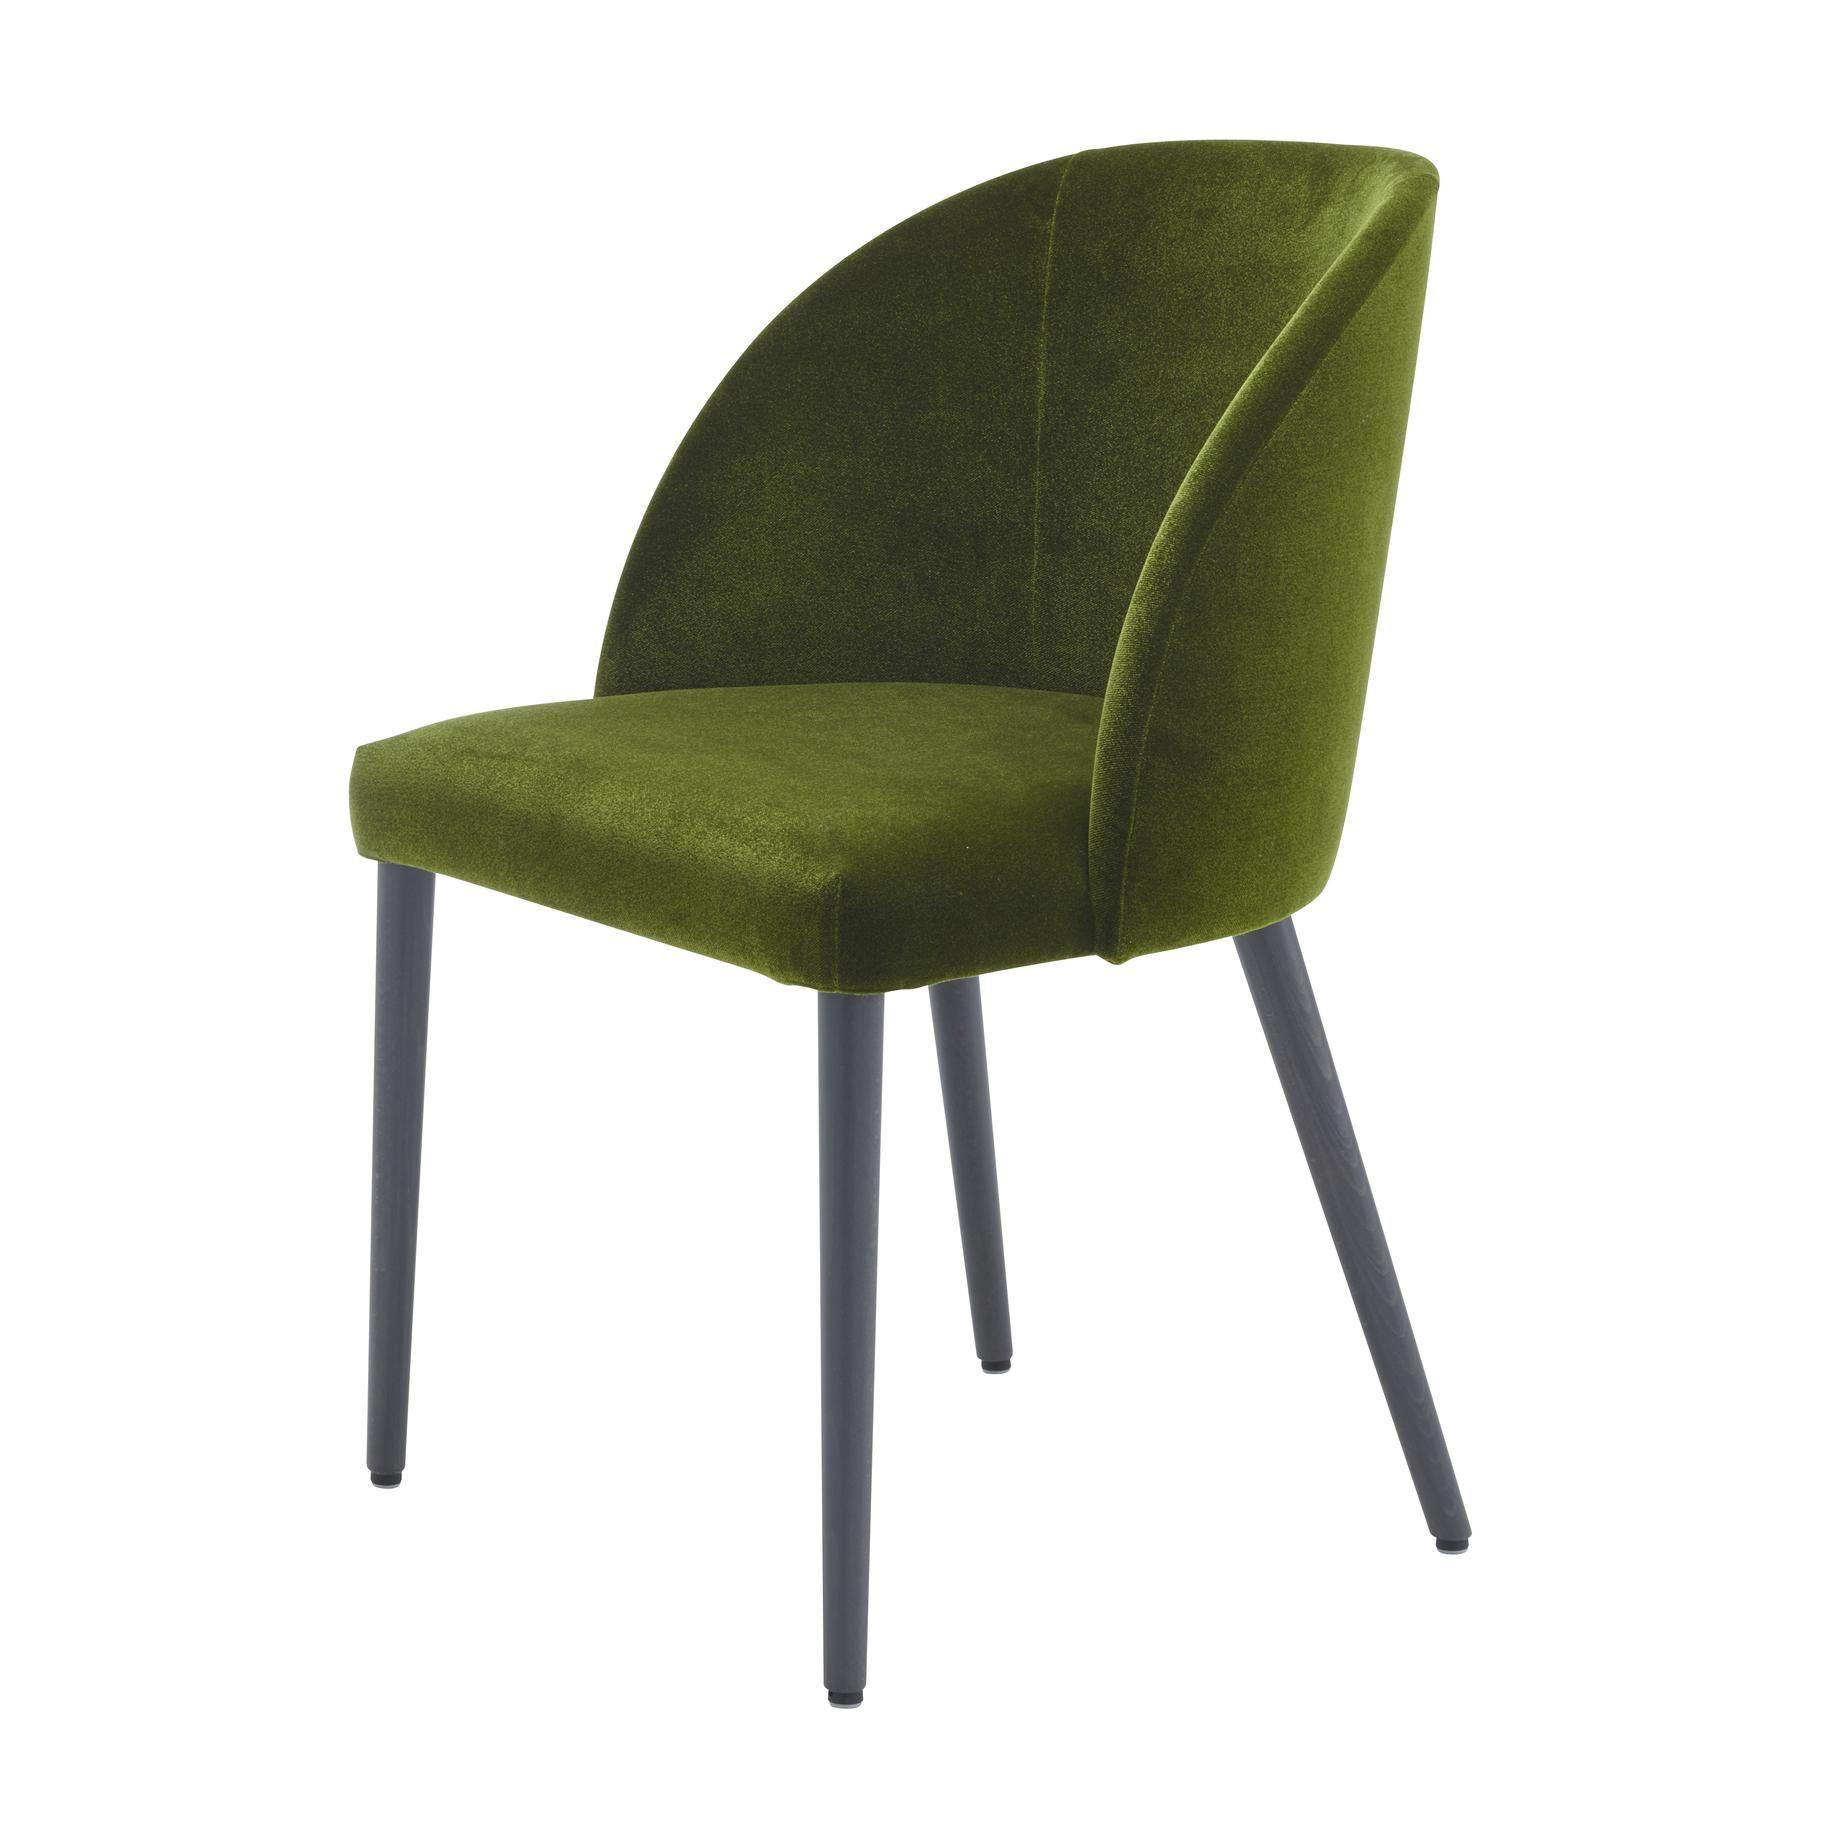 Cimbo Cimba Chairs Designer Ligne Roset Lake Newport